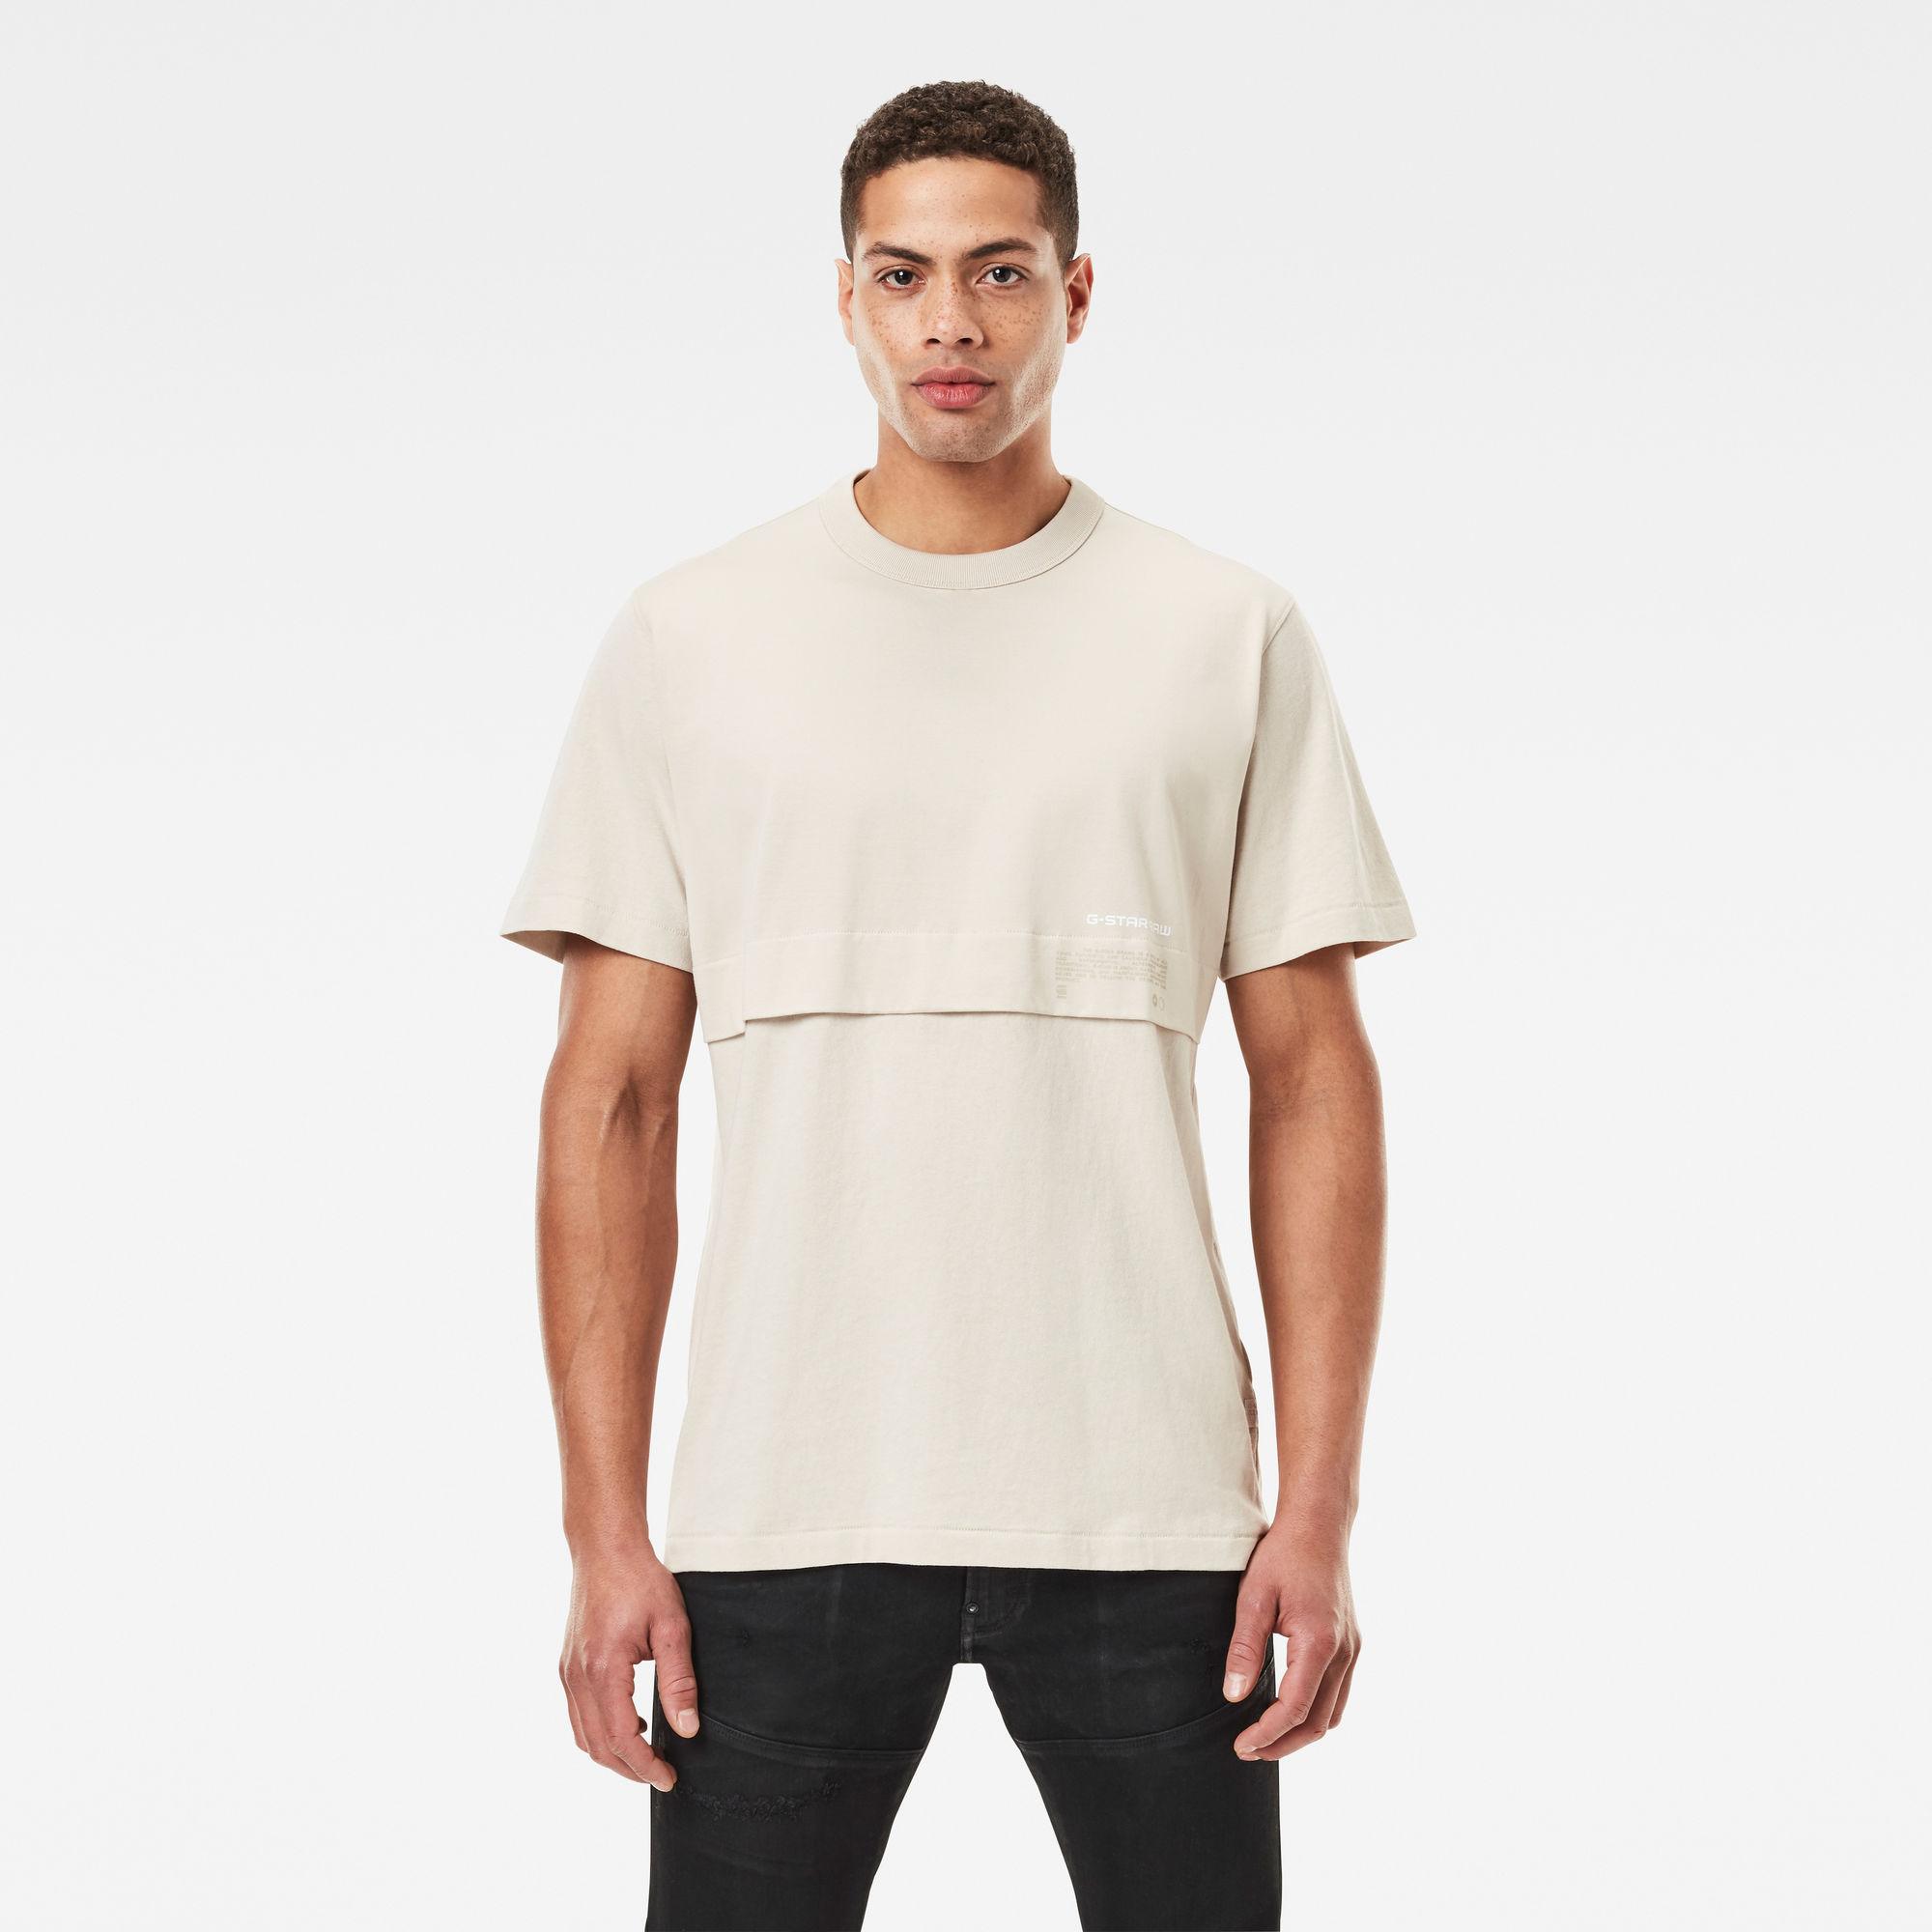 G-Star RAW Heren Mercerized C&S Loose T-Shirt Beige